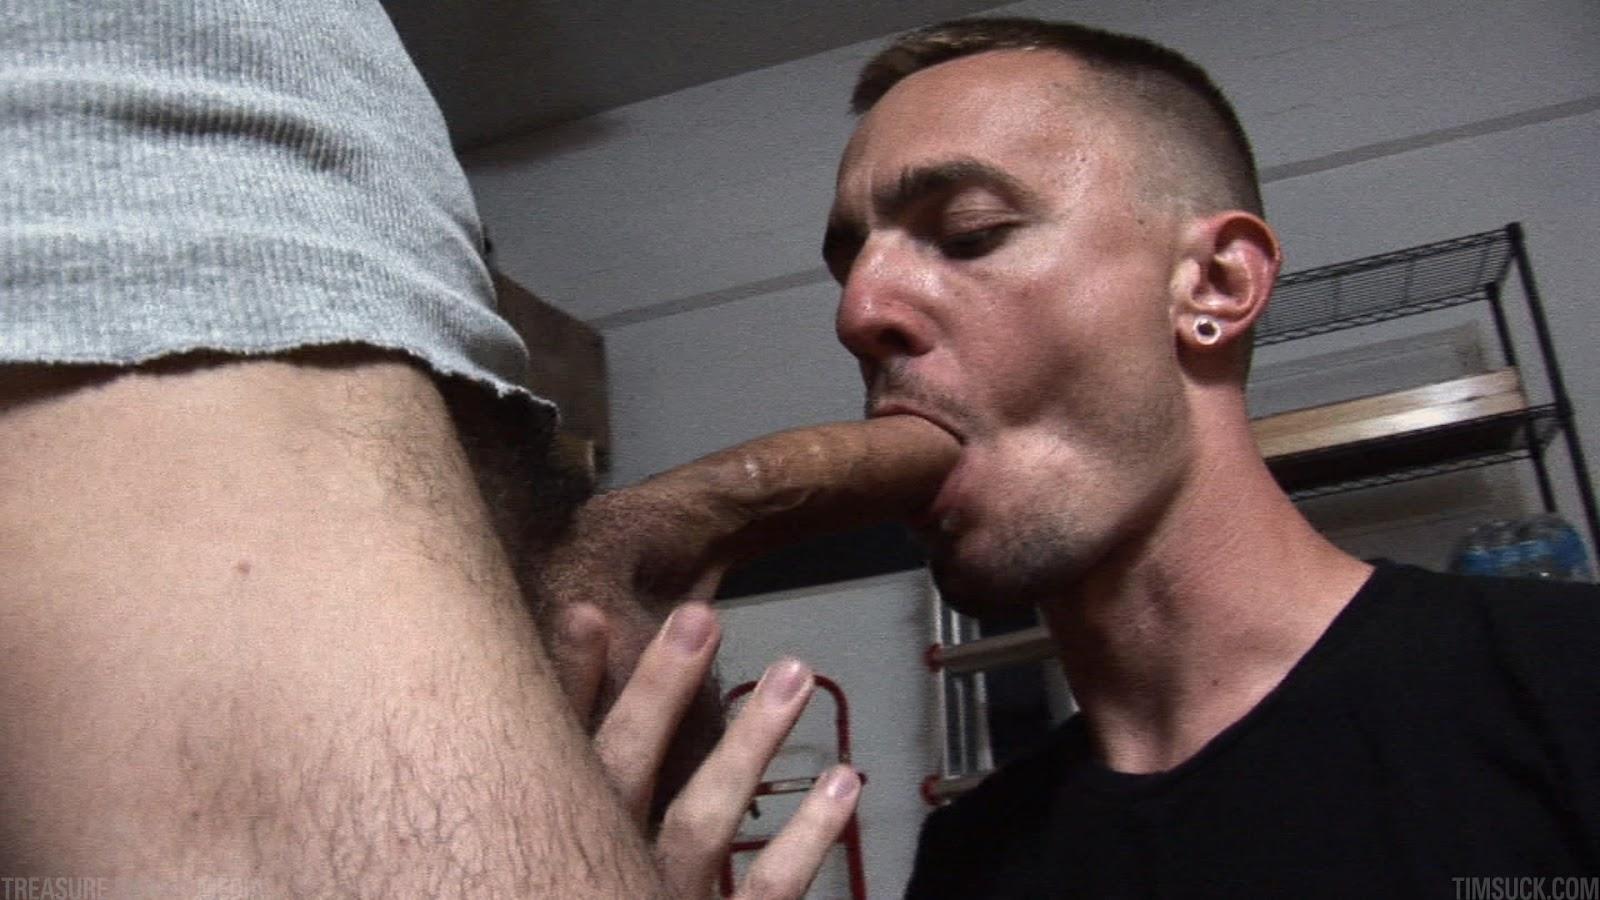 racconti gay gratis Avellino